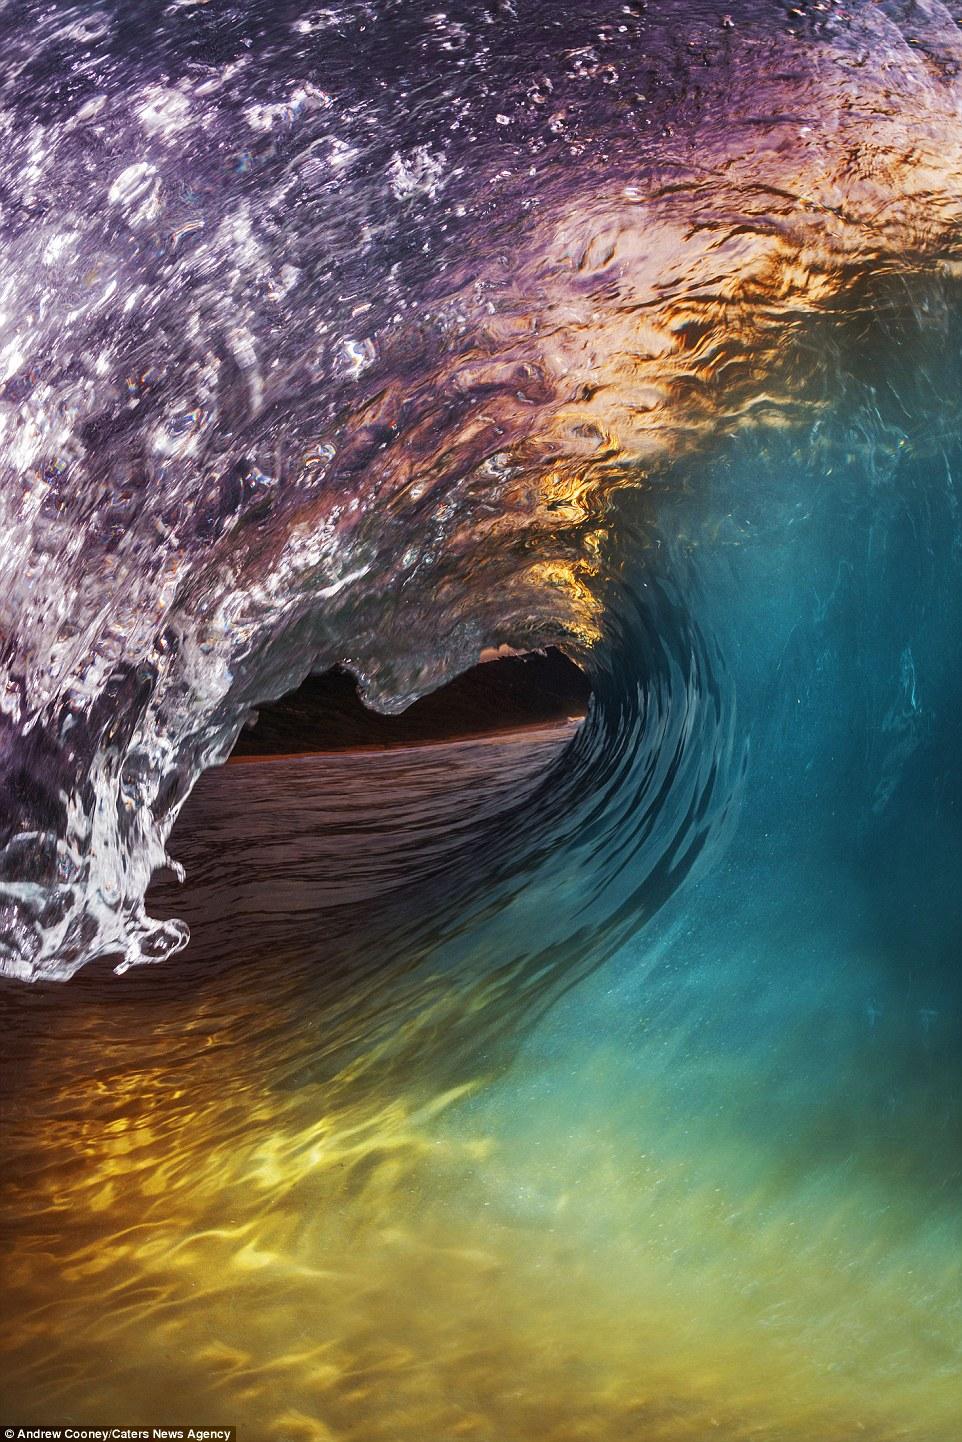 موج سواری,سوار بر موج آب,امواج دریا